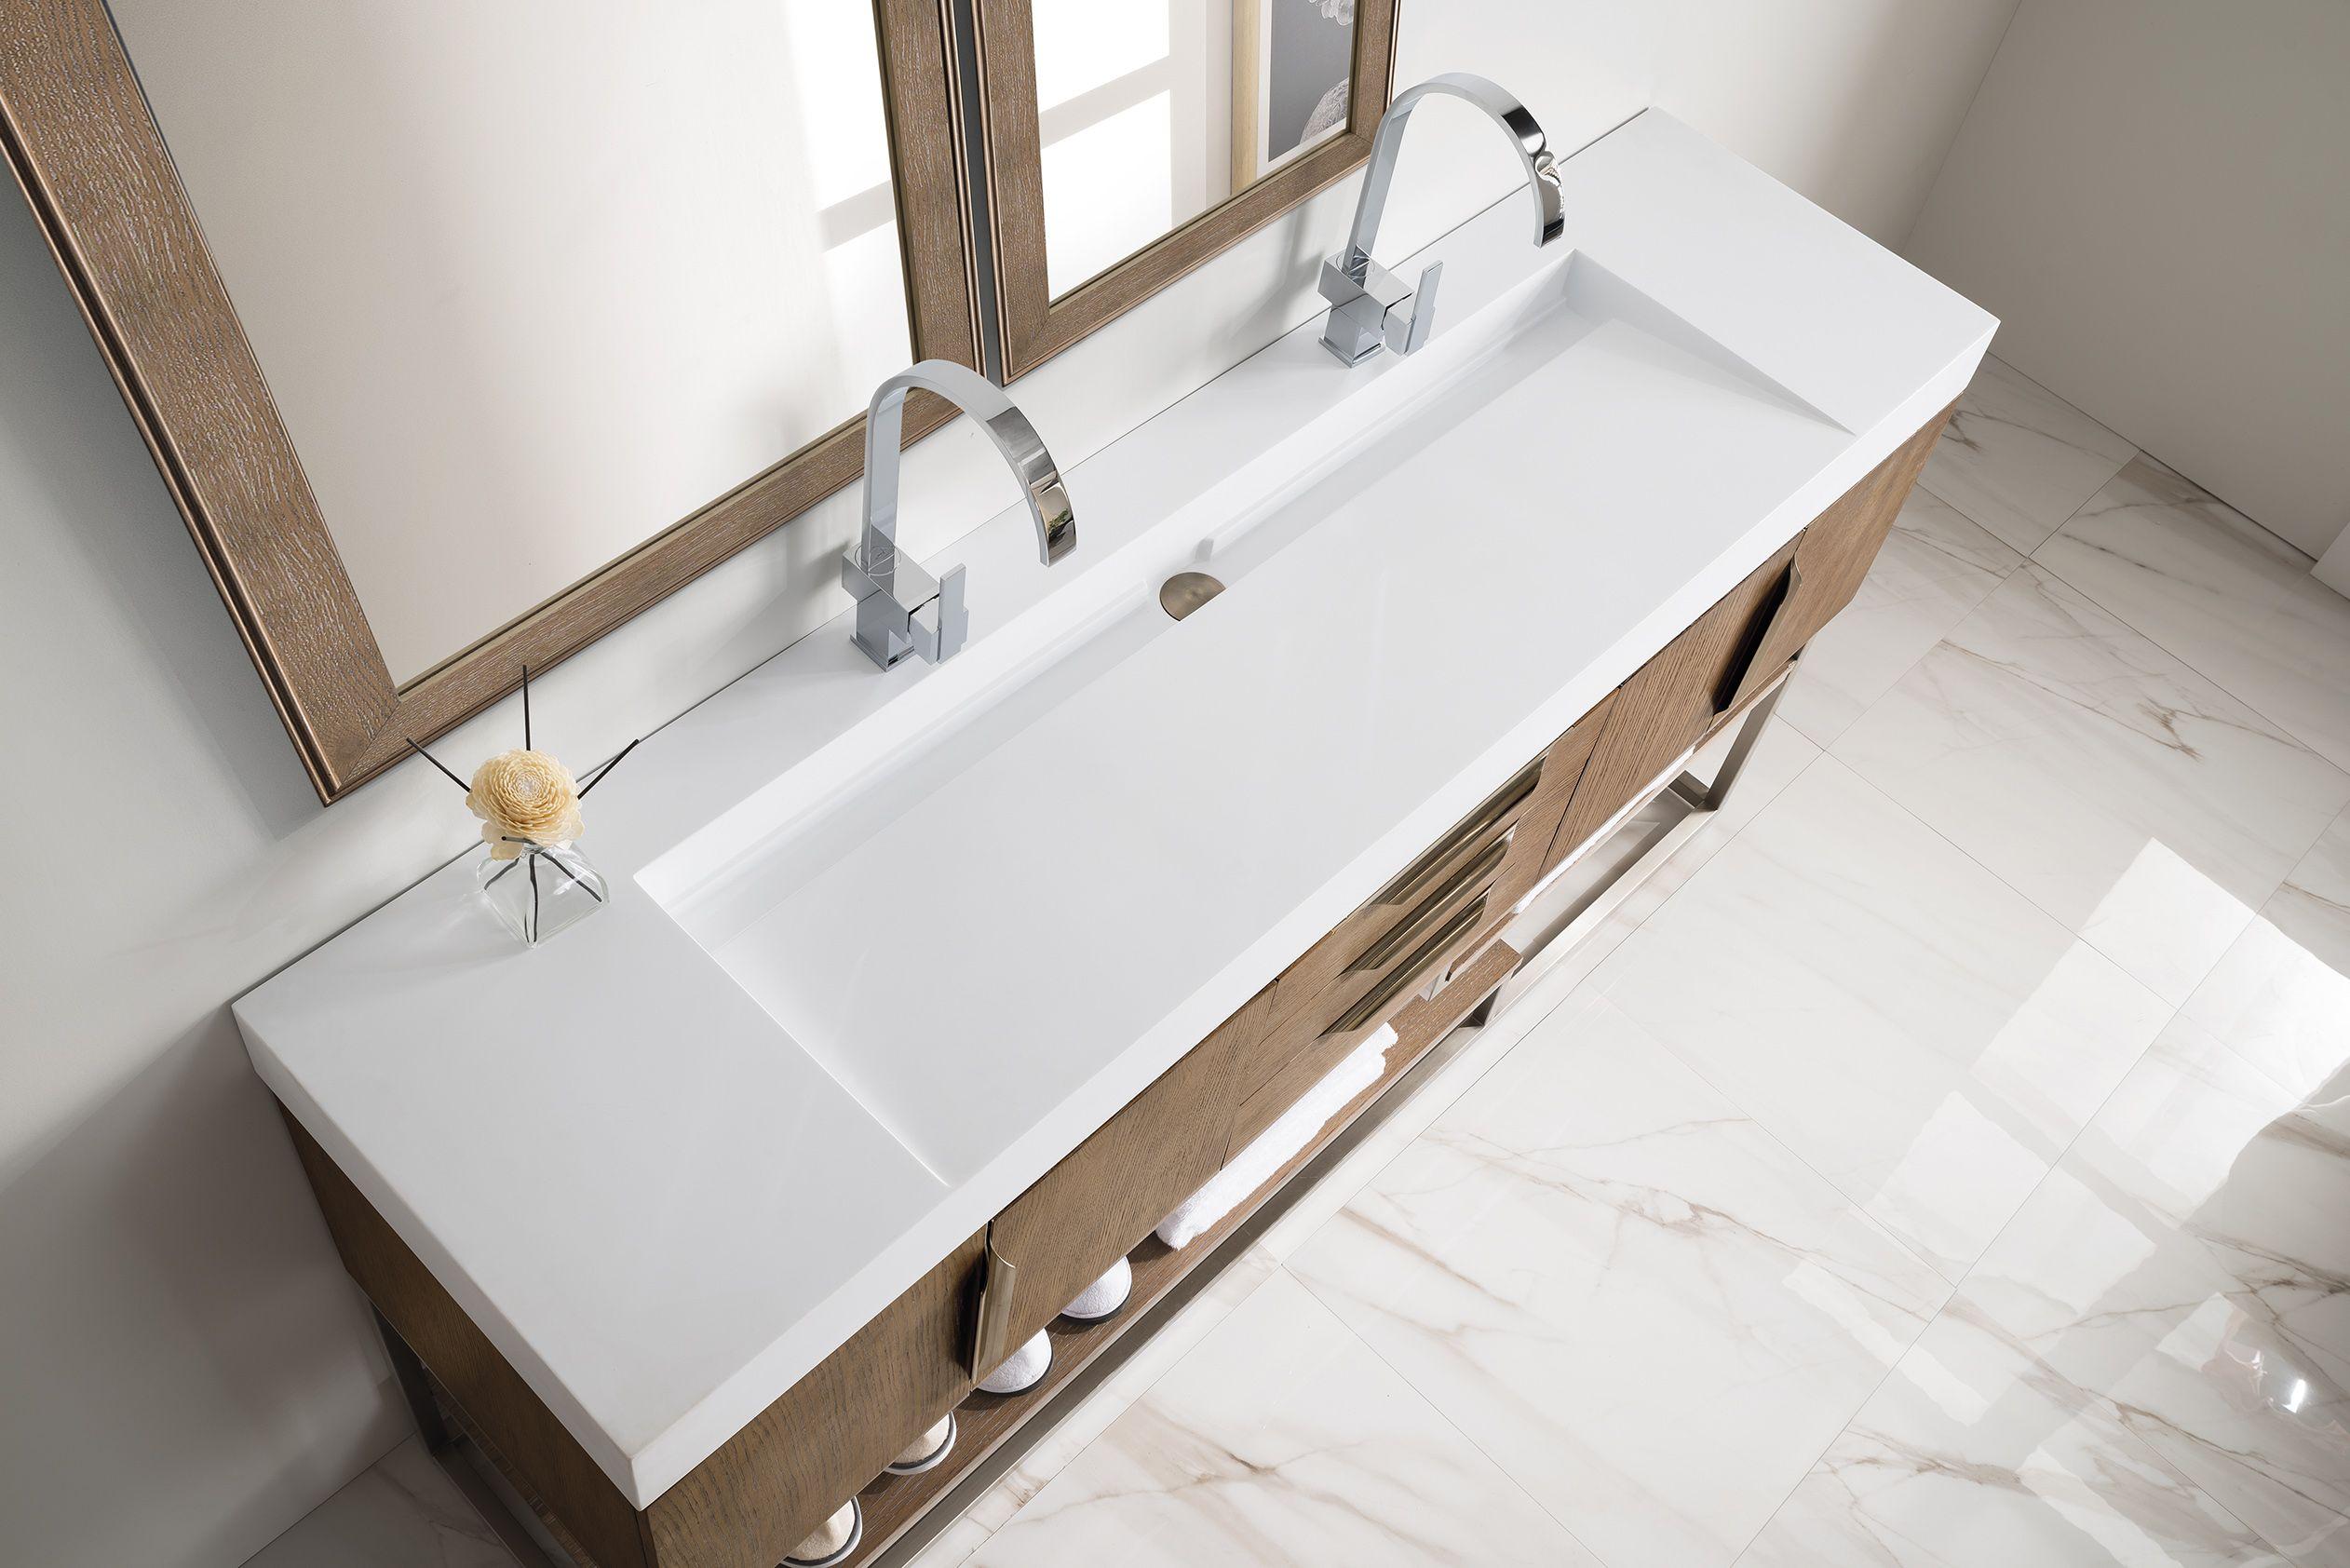 Columbia 72 Double Sink Bathroom Vanity Cabinet Latte Oak Finish White Solid Surface Inte Single Bathroom Vanity Double Vanity Single Sink Bathroom Vanity